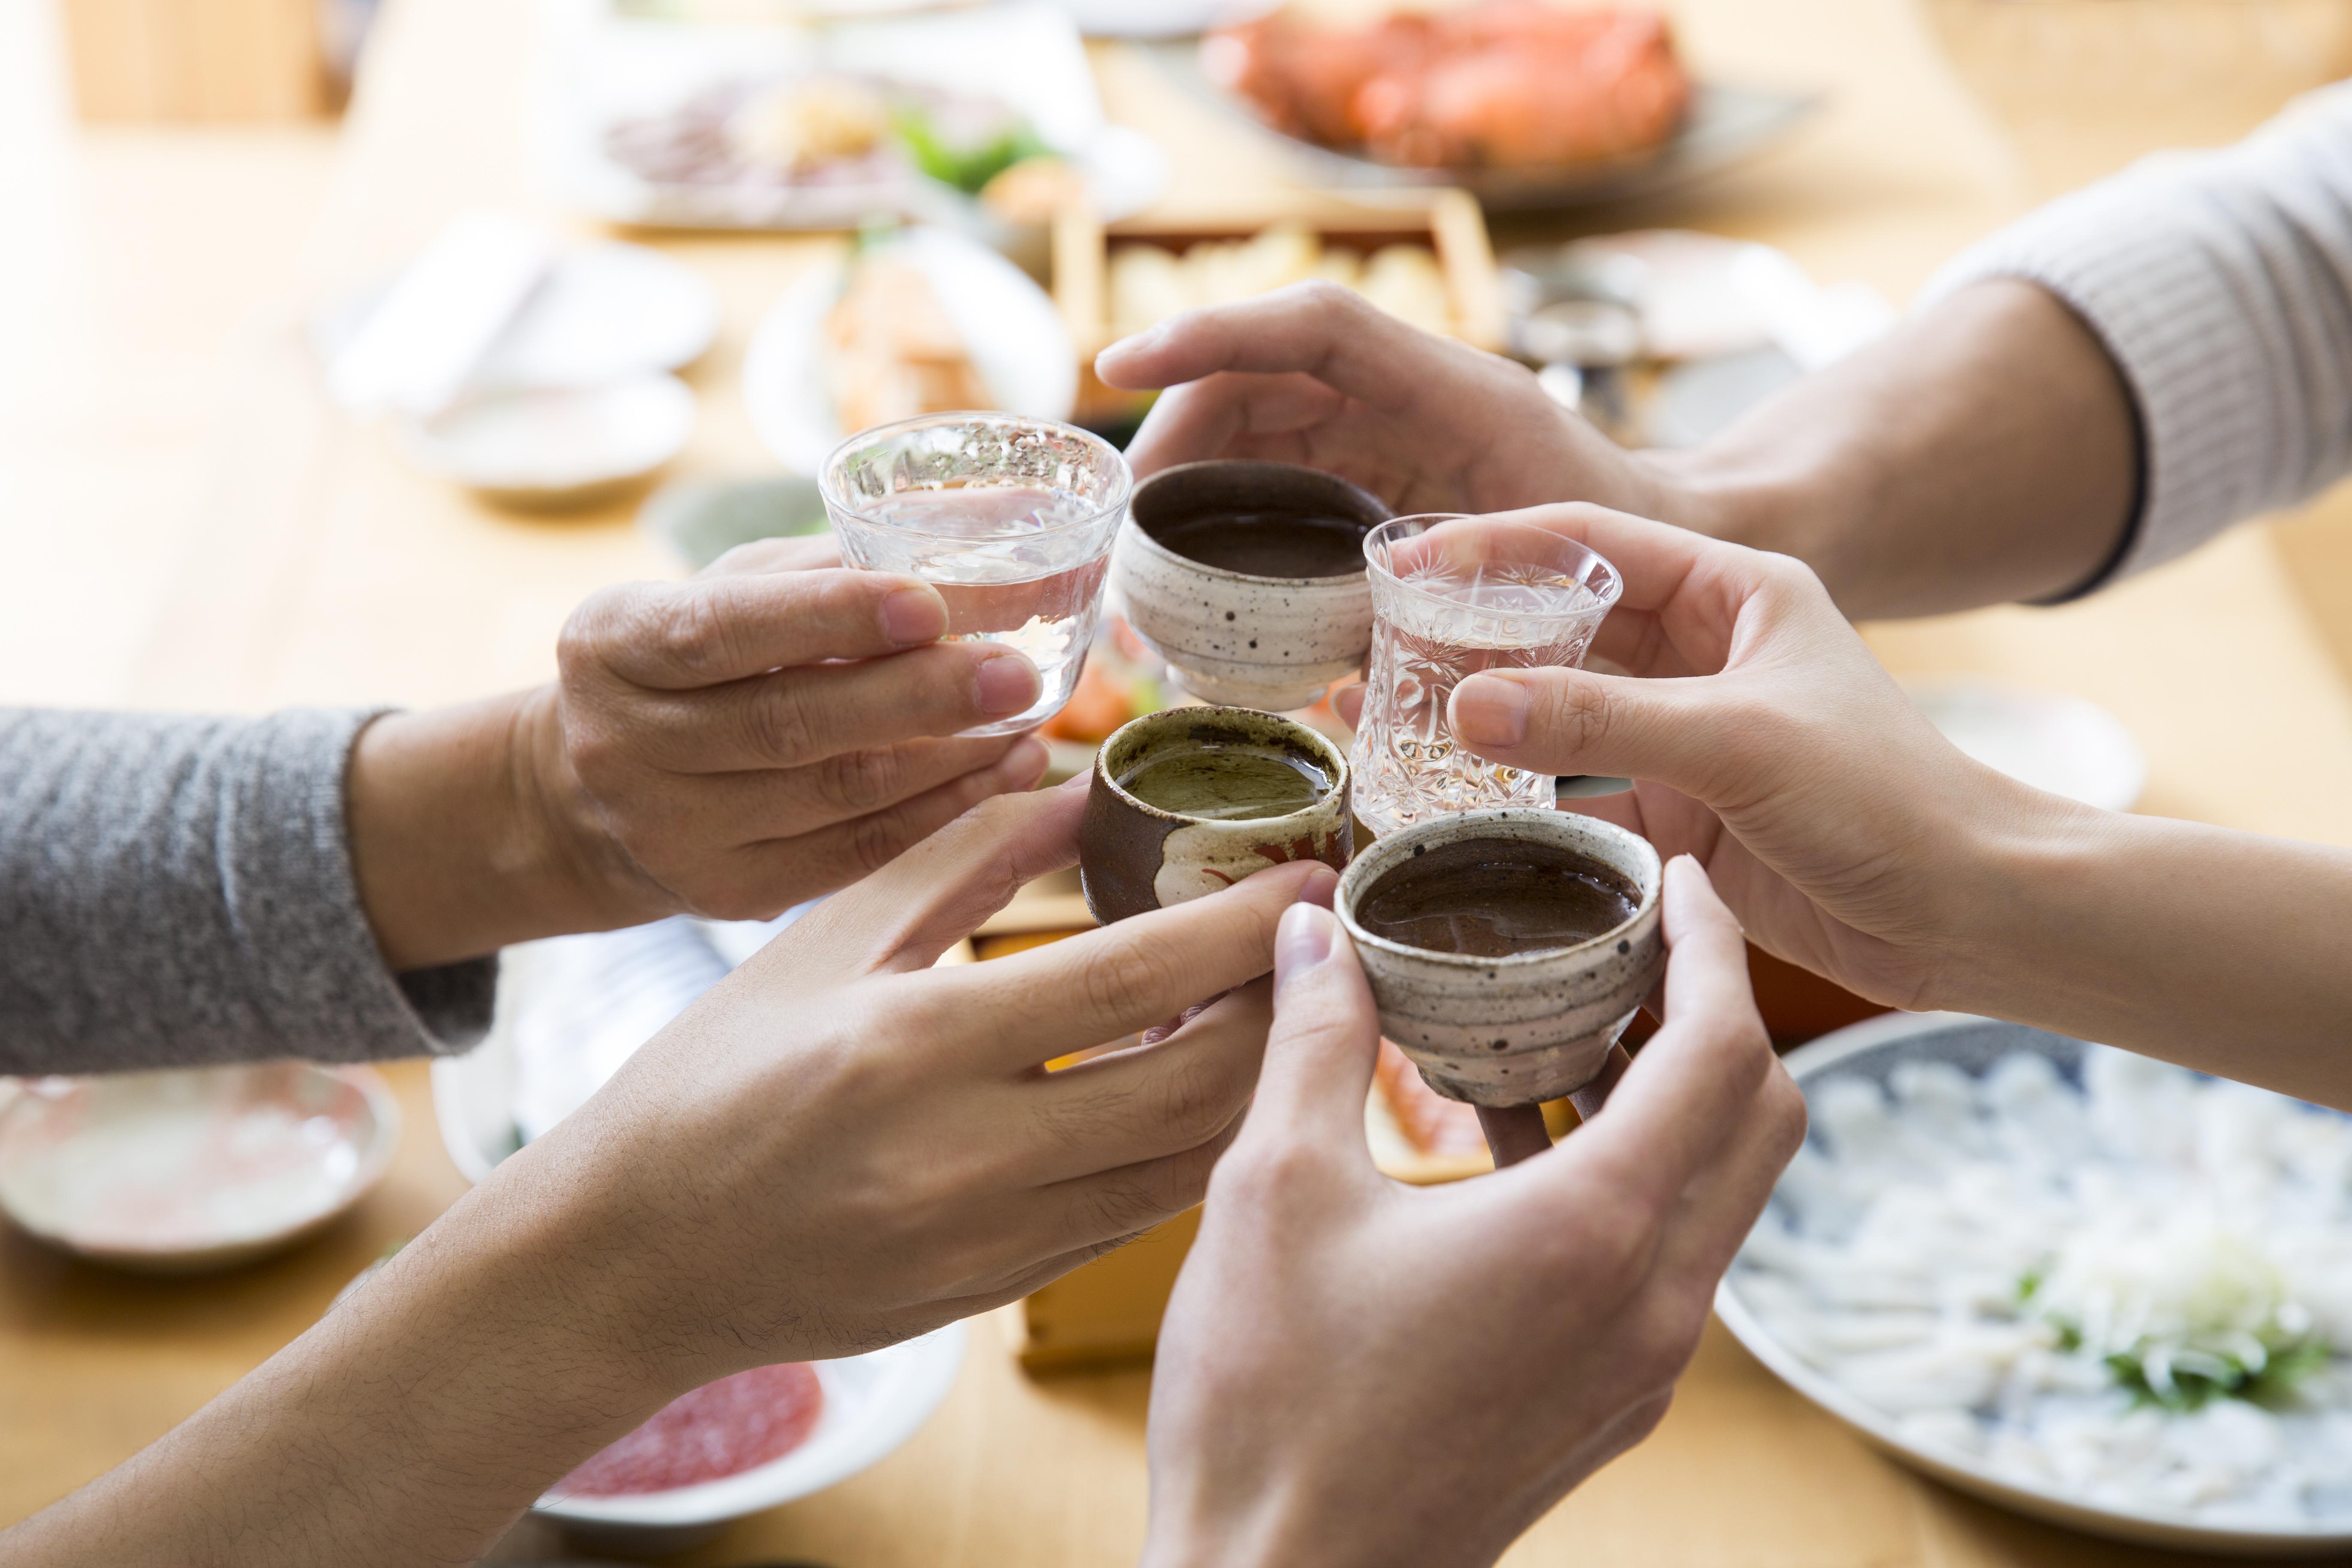 Club saké japonais - Toulouse saké club evenements